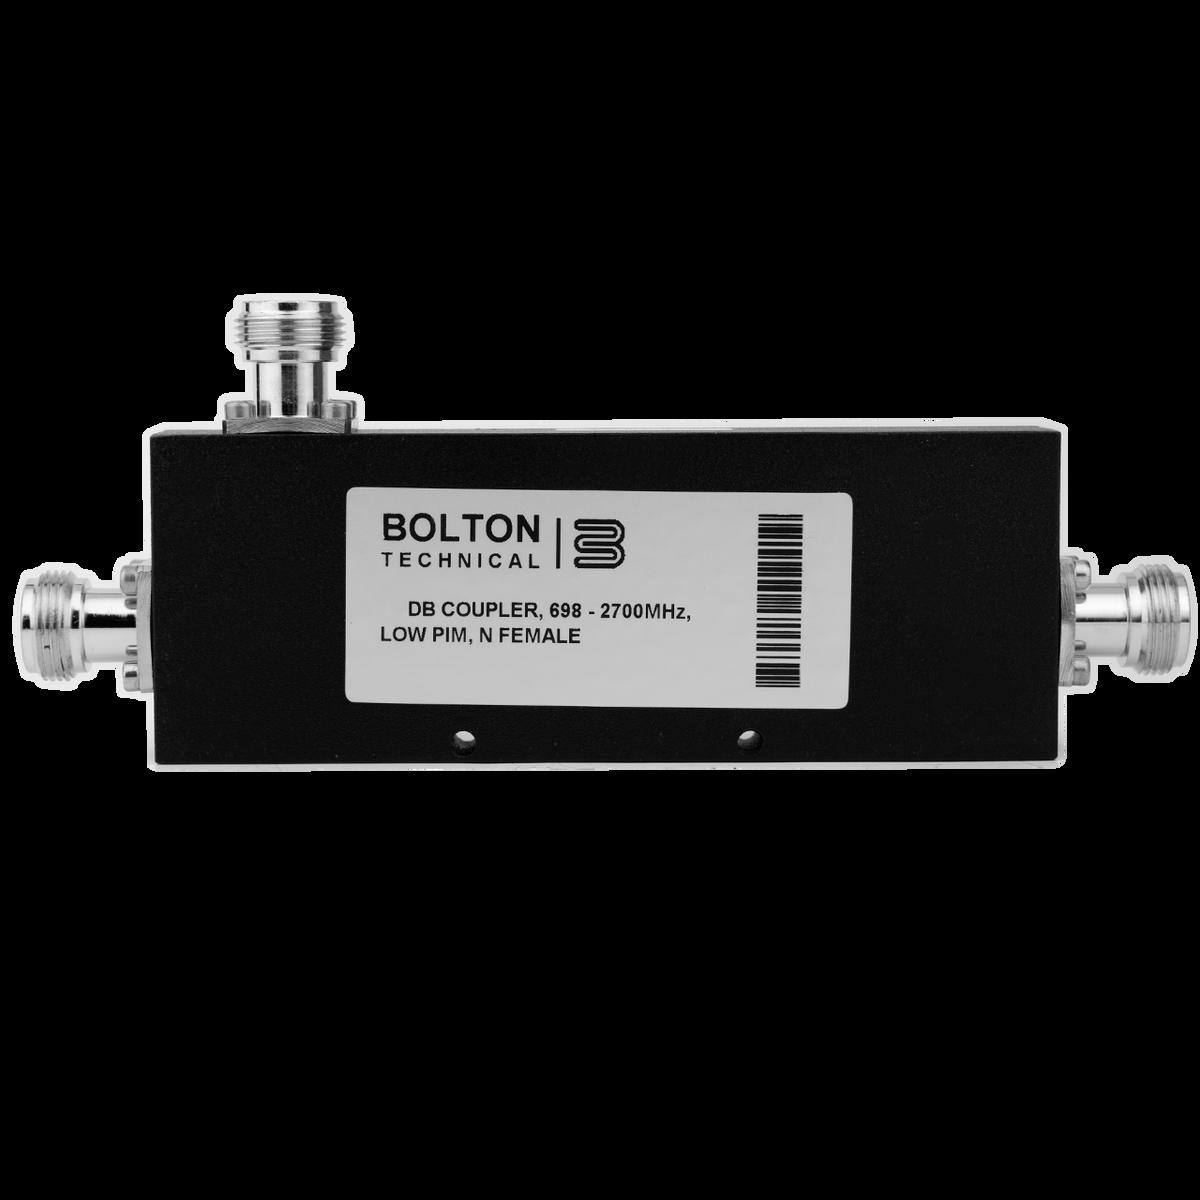 Bolton Technical 15 dB Coupler, 698-2700 MHz, Low-PIM, N-Female